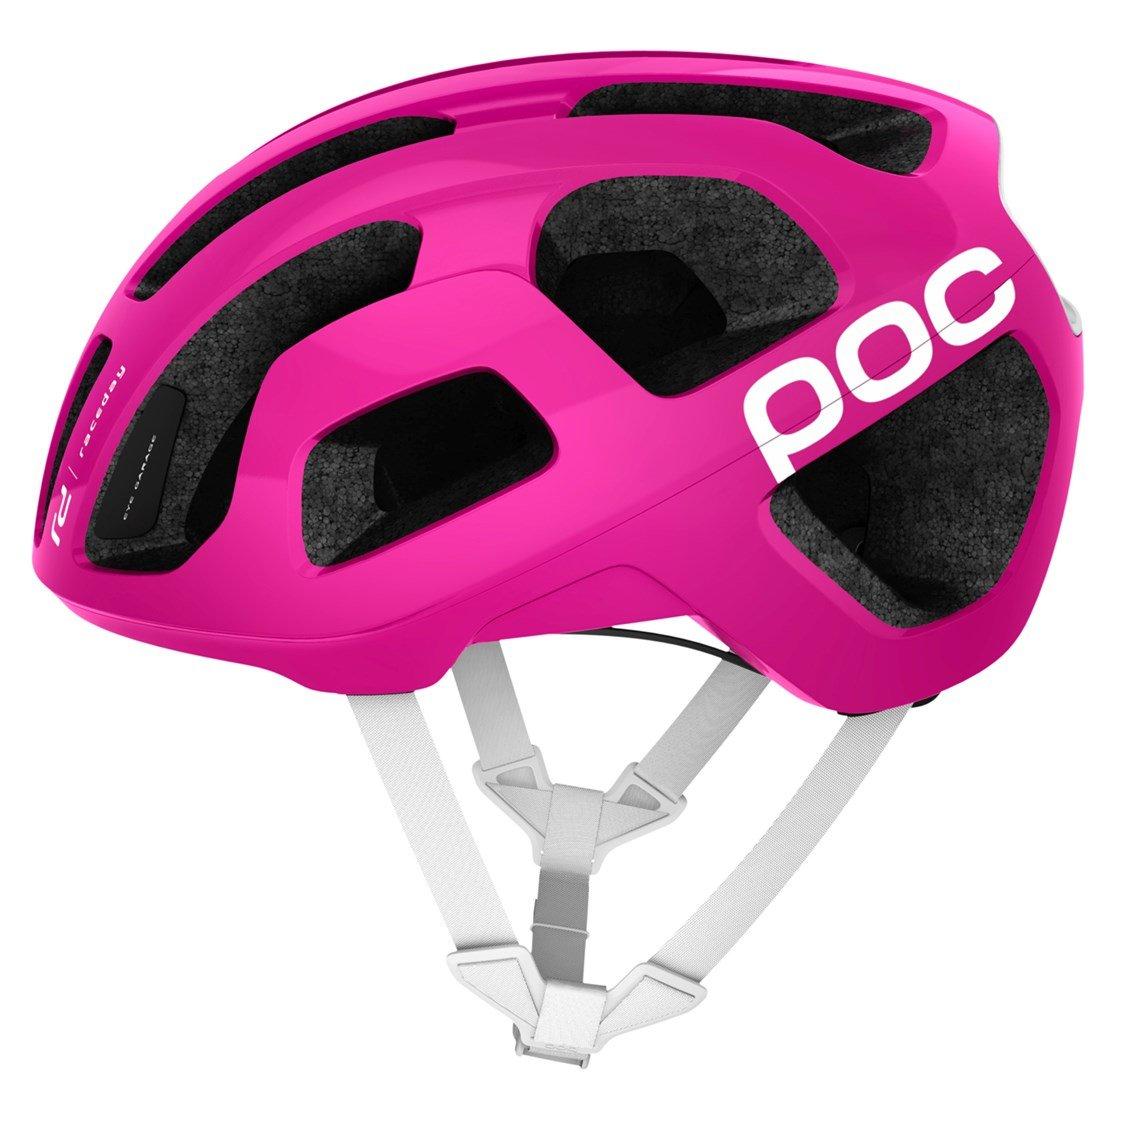 POC Octal (CPSC) Bike Helmet, Fluorescent Pink, Small